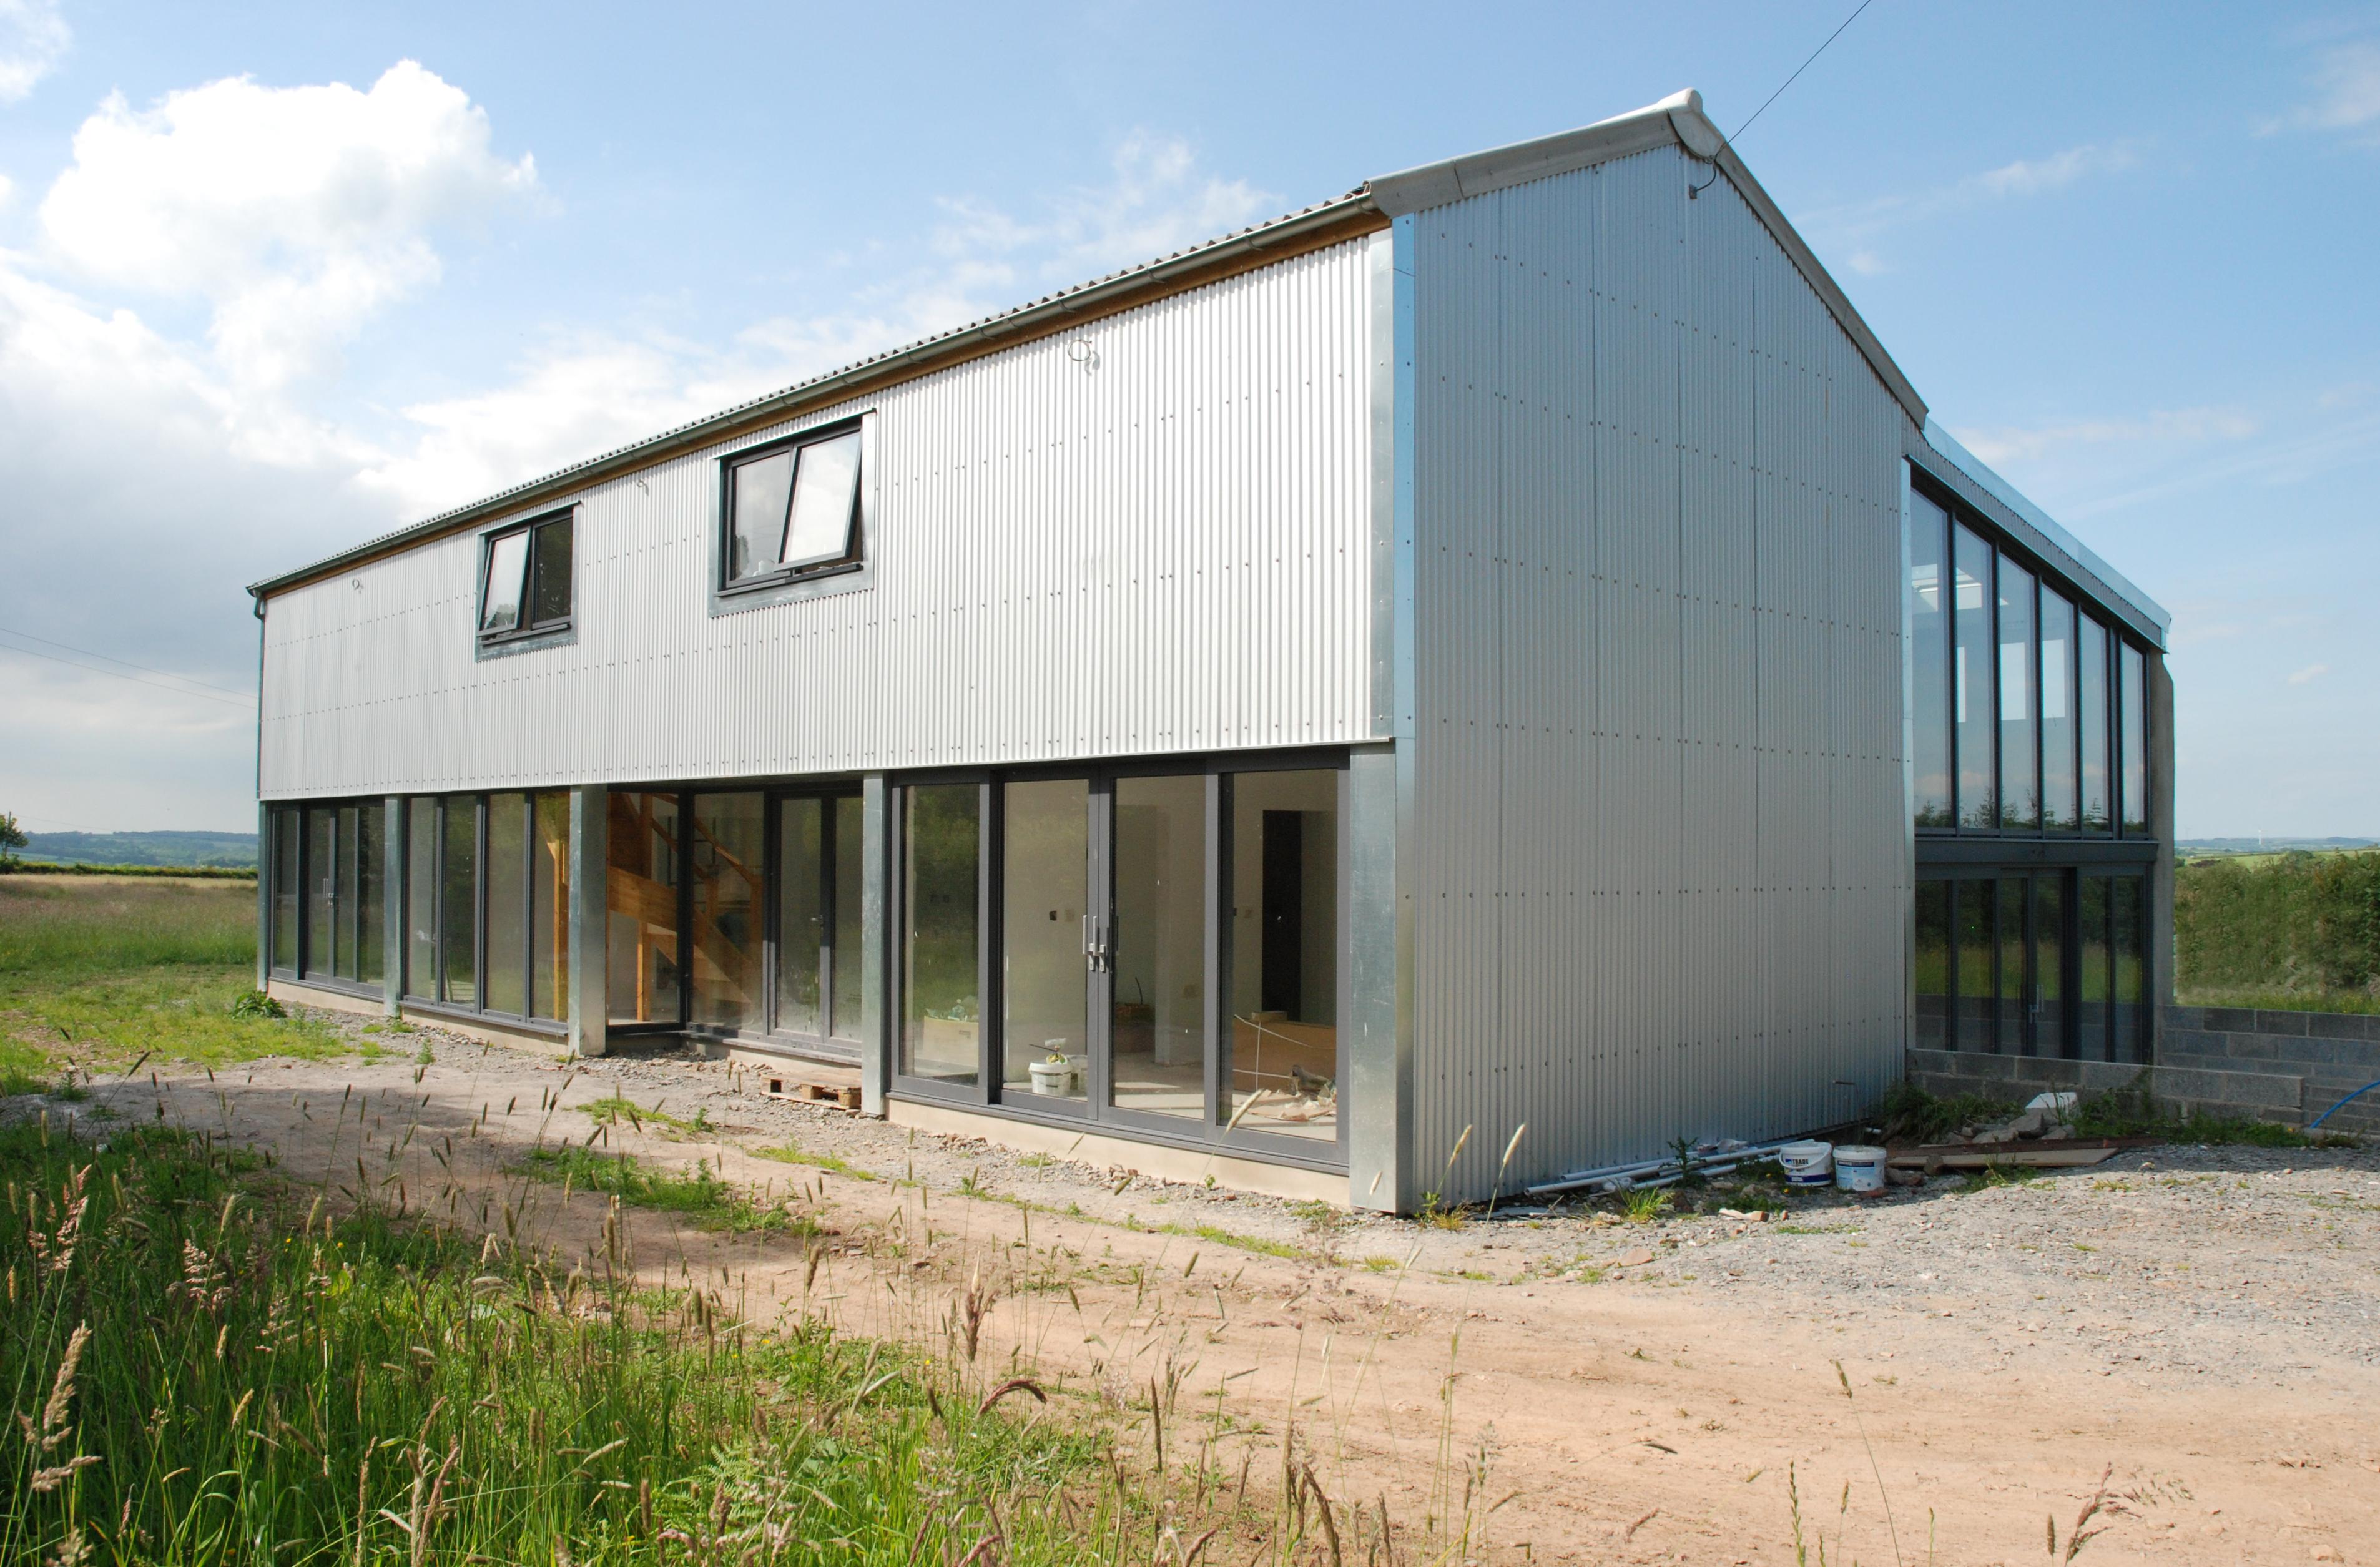 Thelbridge Barn Conversion Timber Intent Architecture